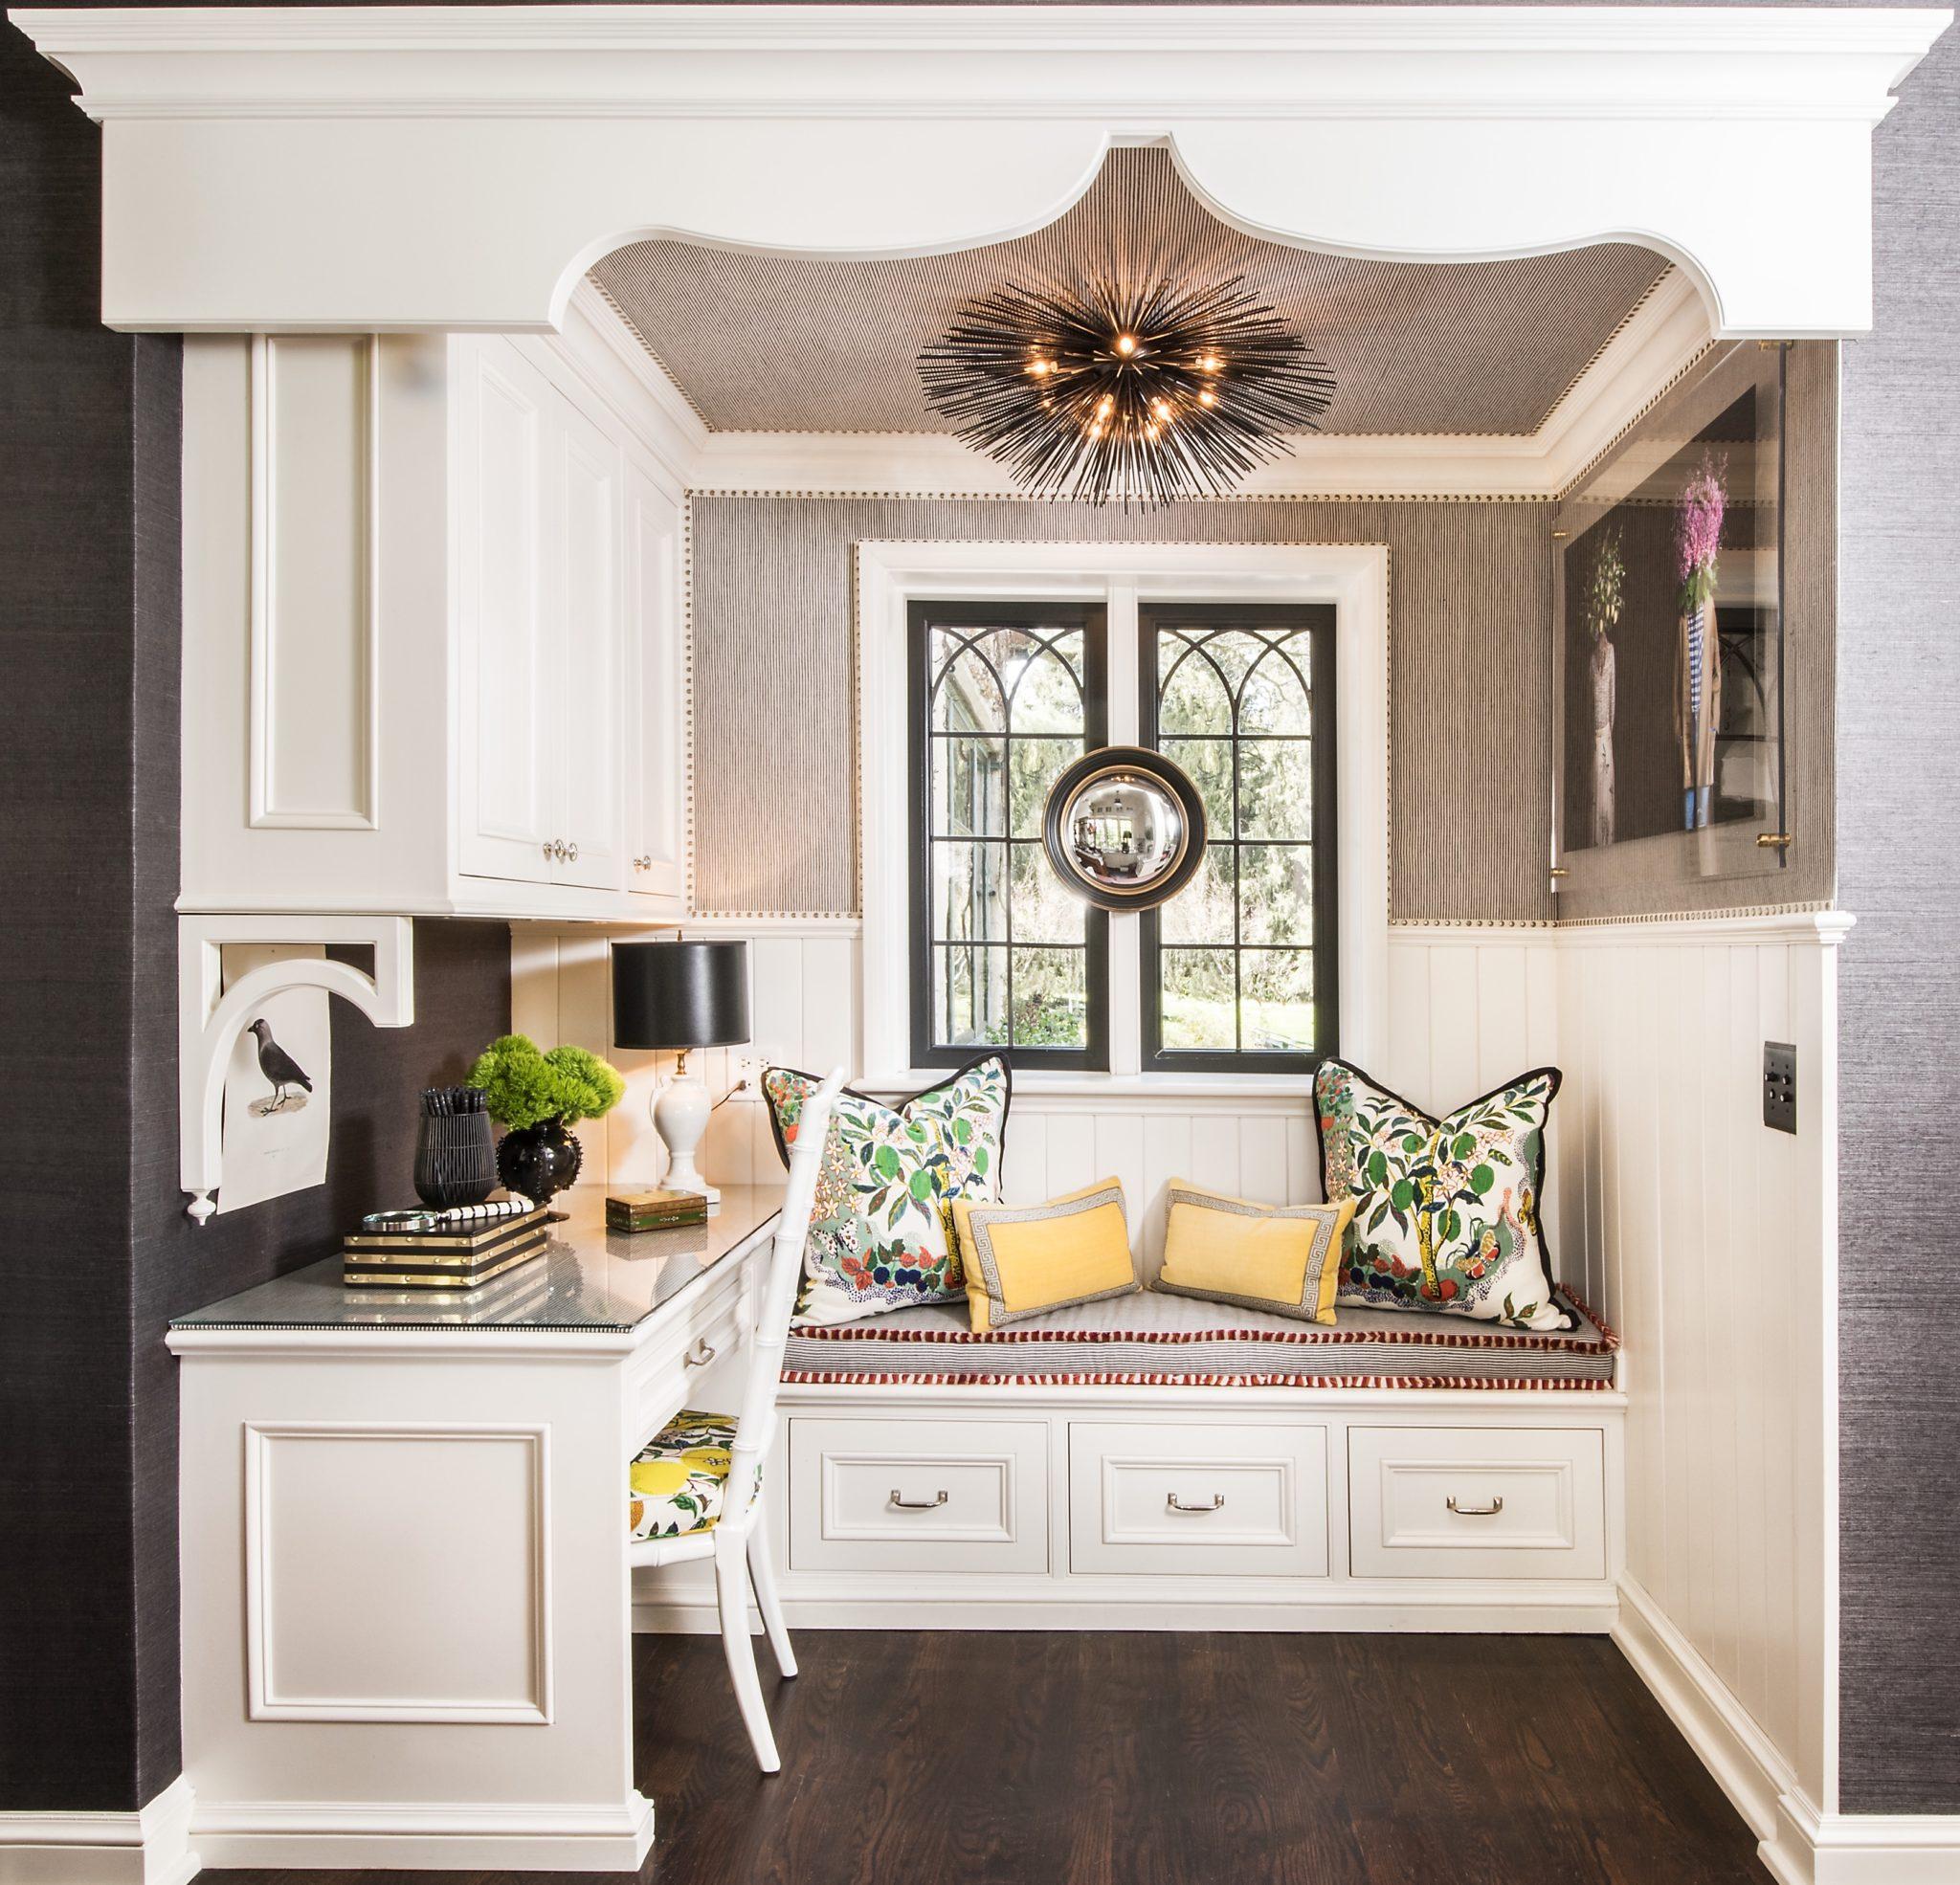 Kitchen office nook by M and M Interior Design